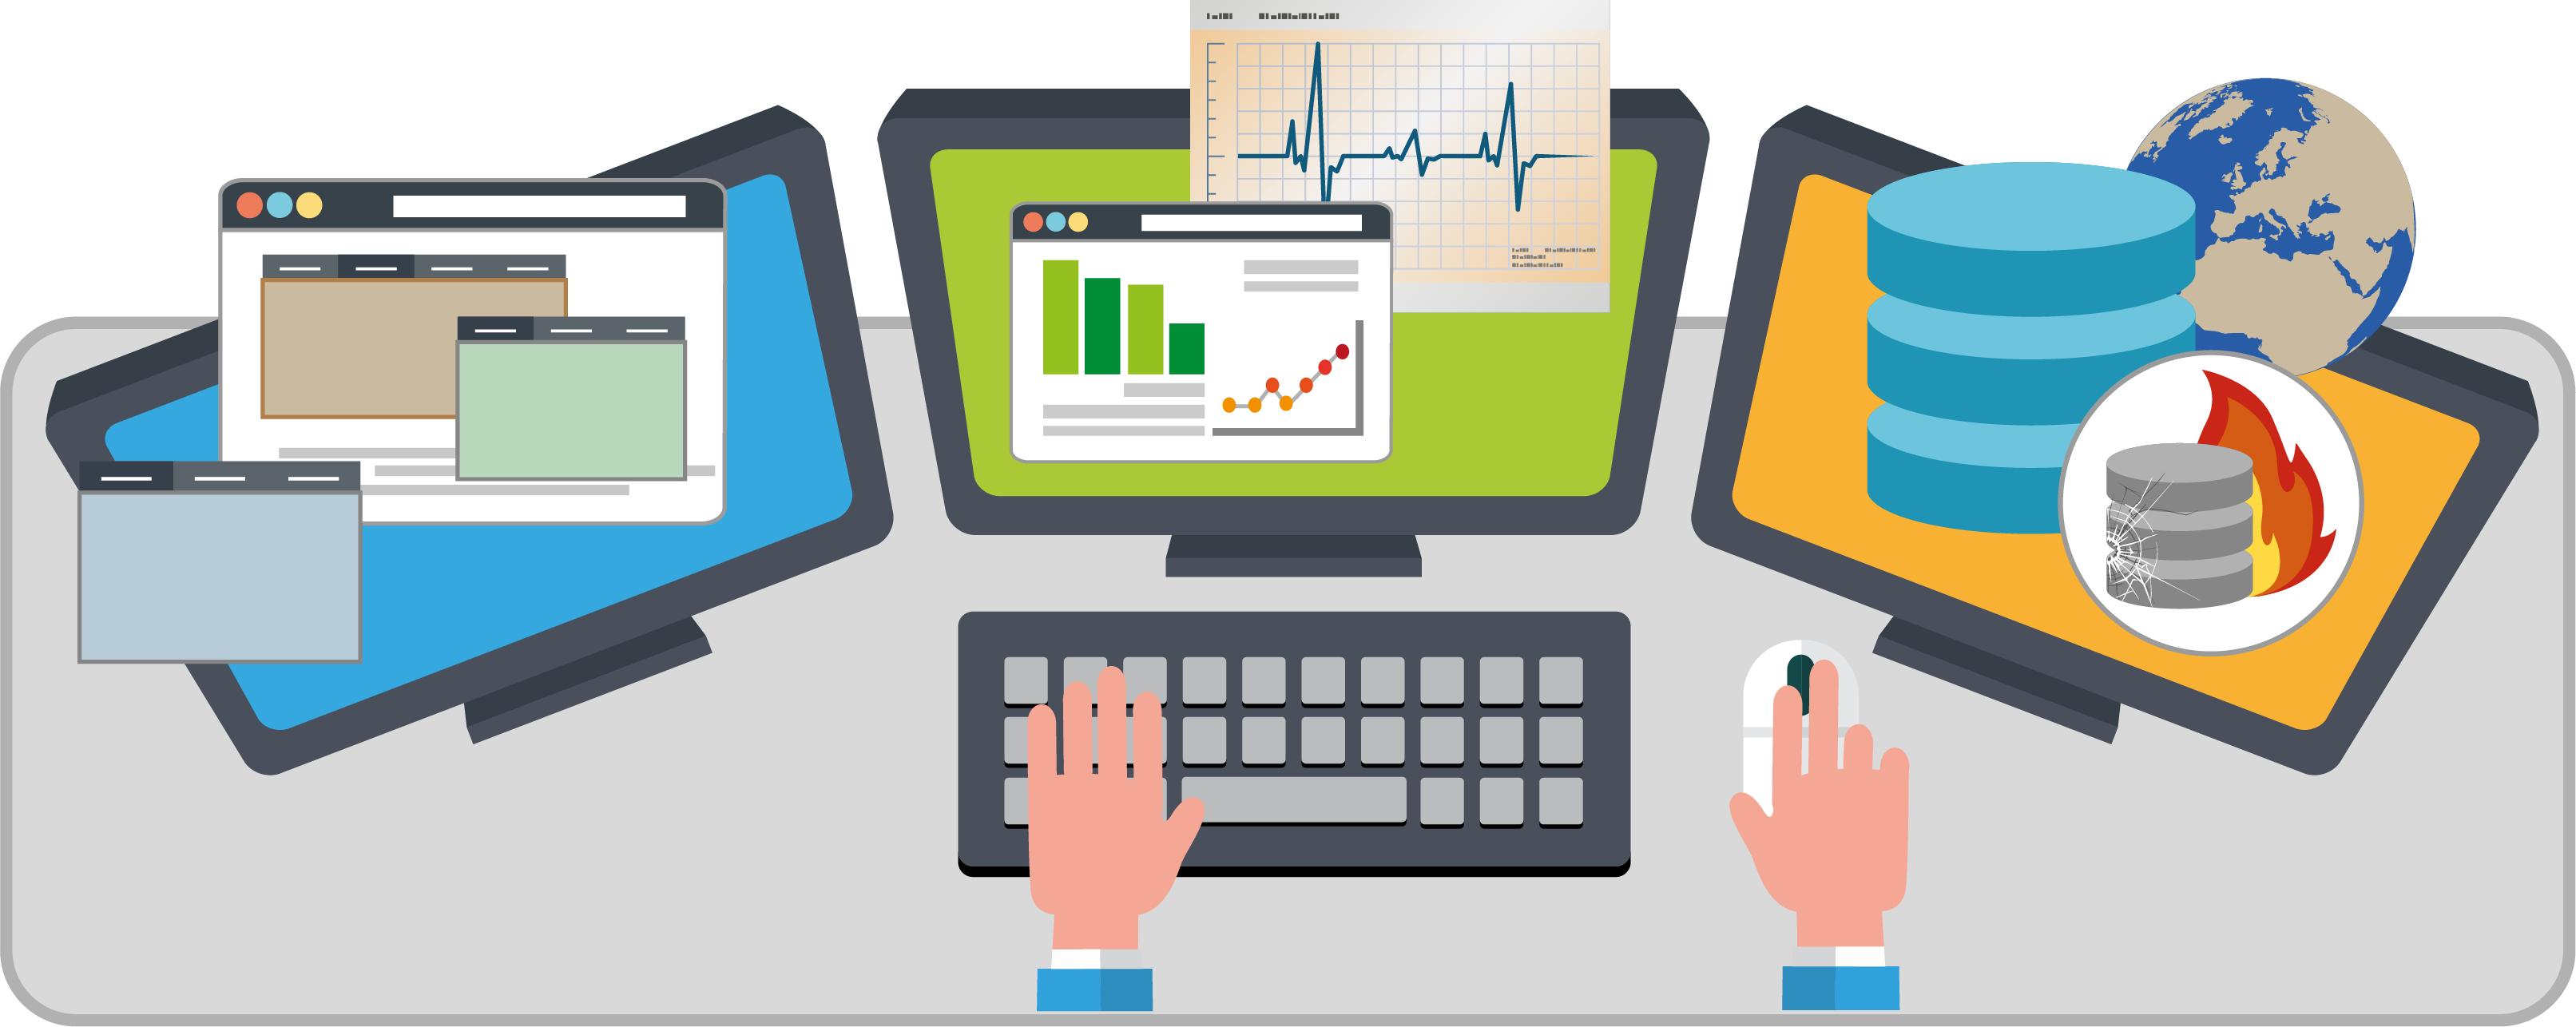 rdba postgresql, Remote DBA postgresql, rdba monitoring service